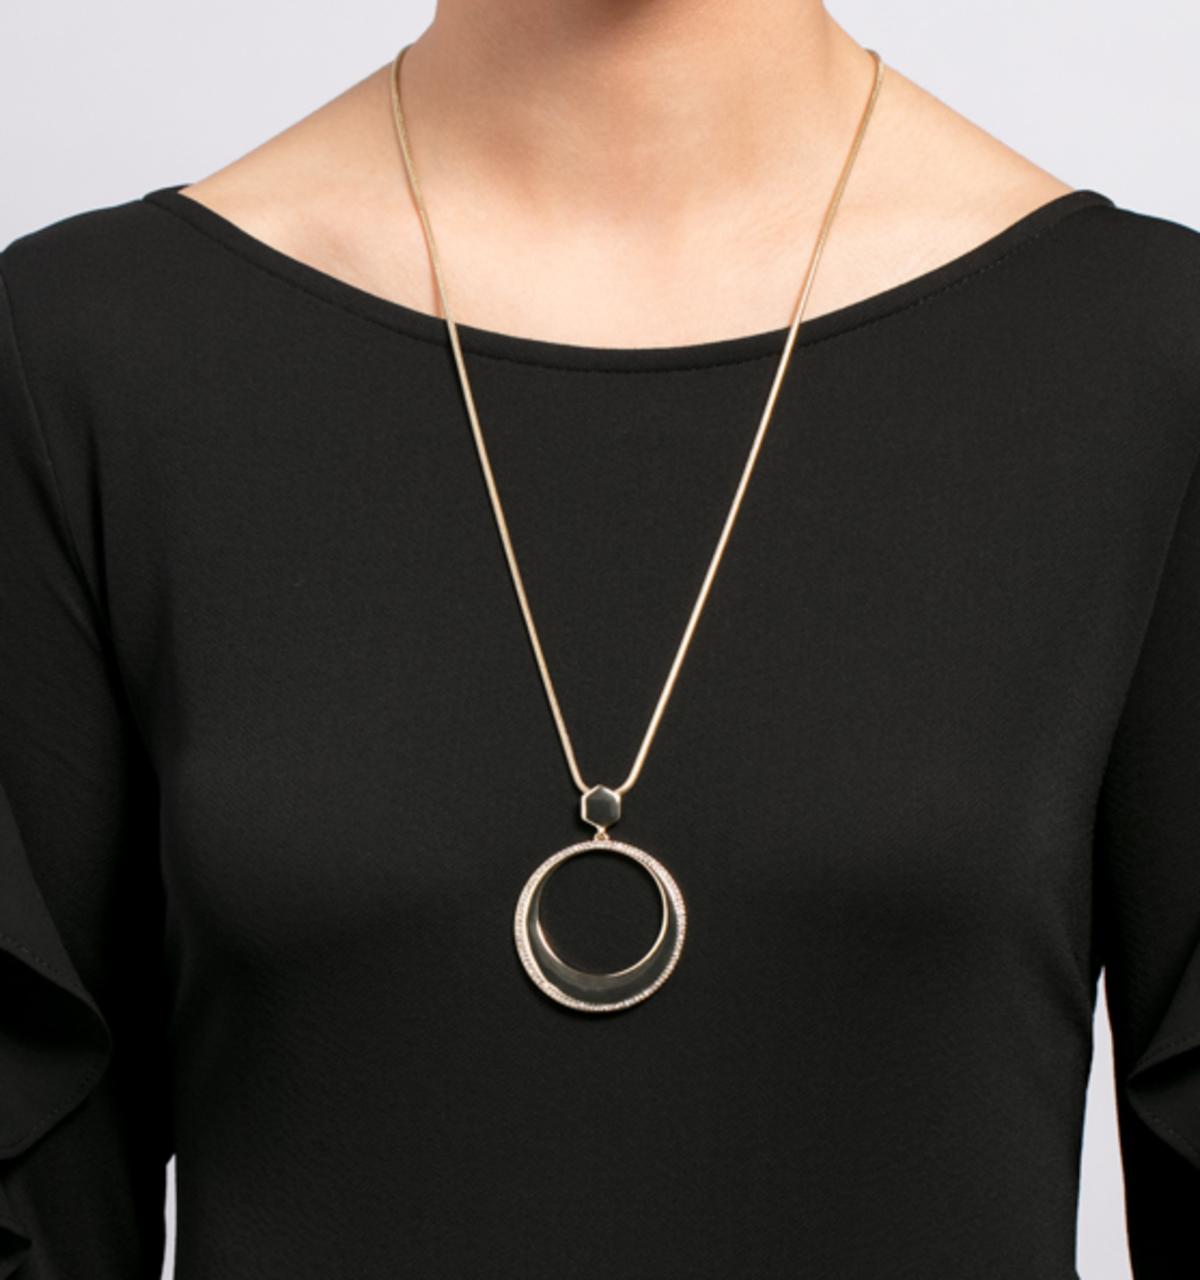 Soho social adjustable pendant necklace